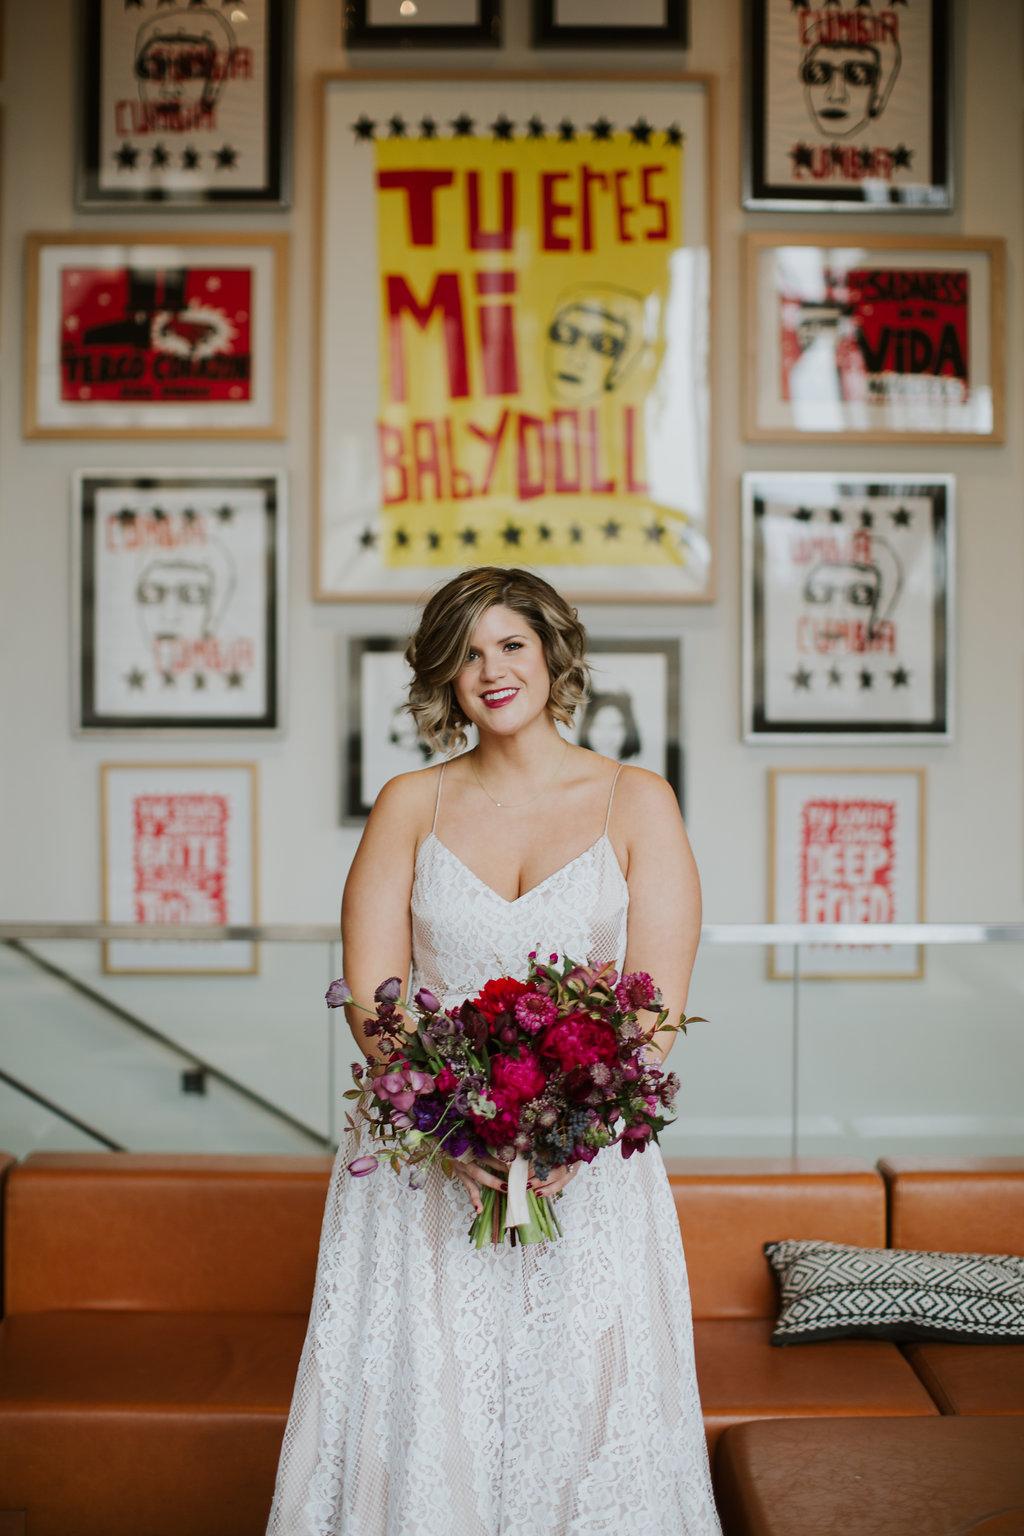 Paige-Newton-Intimate-Wedding-Photographer-Malverde-Wedding-Photography0017.jpg